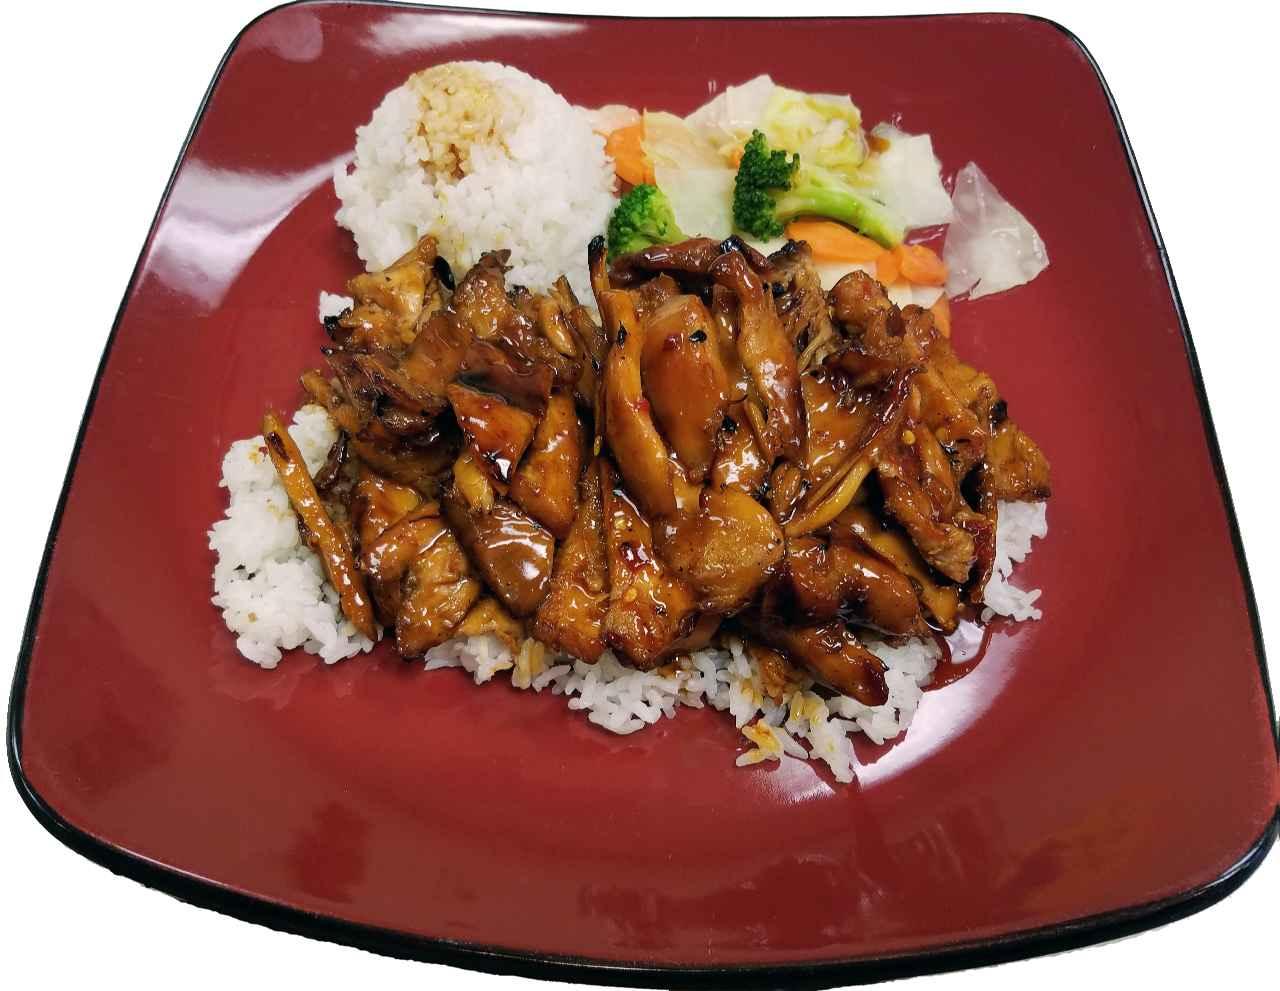 #3. Spicy Tangerine Teriyaki Zingy! – HOT!